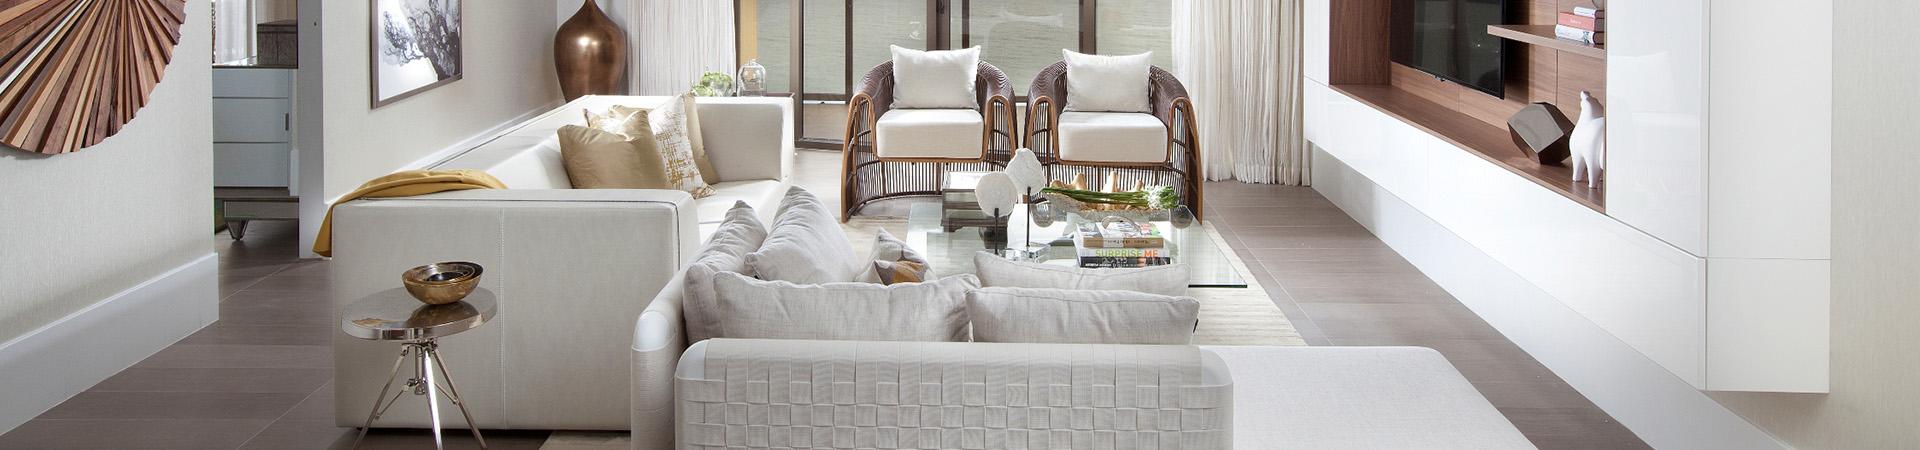 Clean-Modern-Apartment-Interior-Living-Room-Design-2